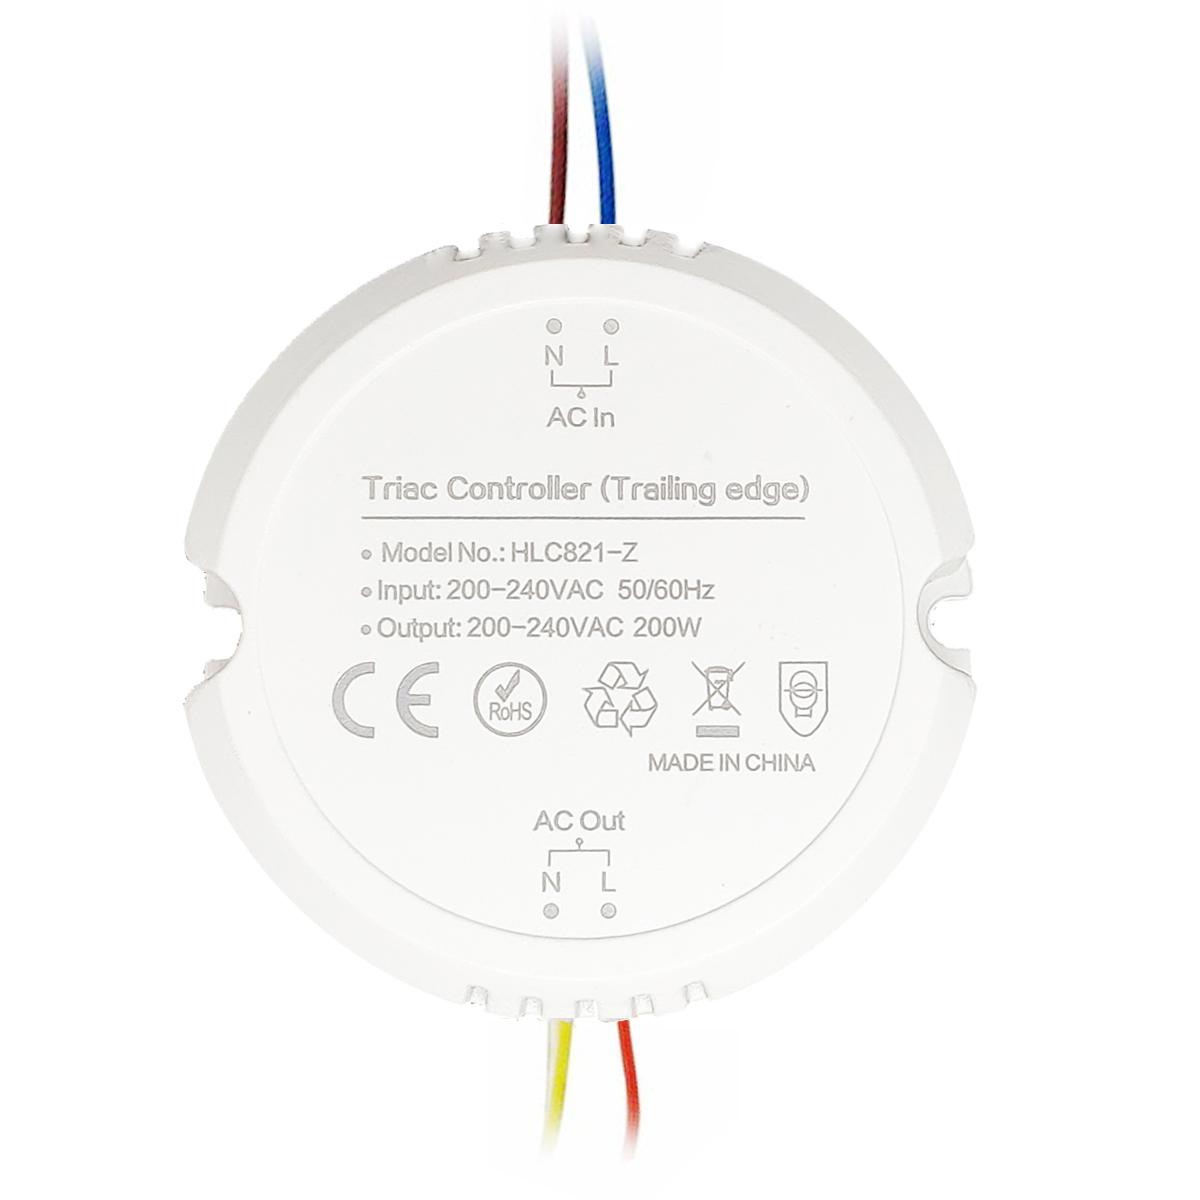 zigbee 200w smart triac led dimming controller for amazon alexa echo plus ac220v